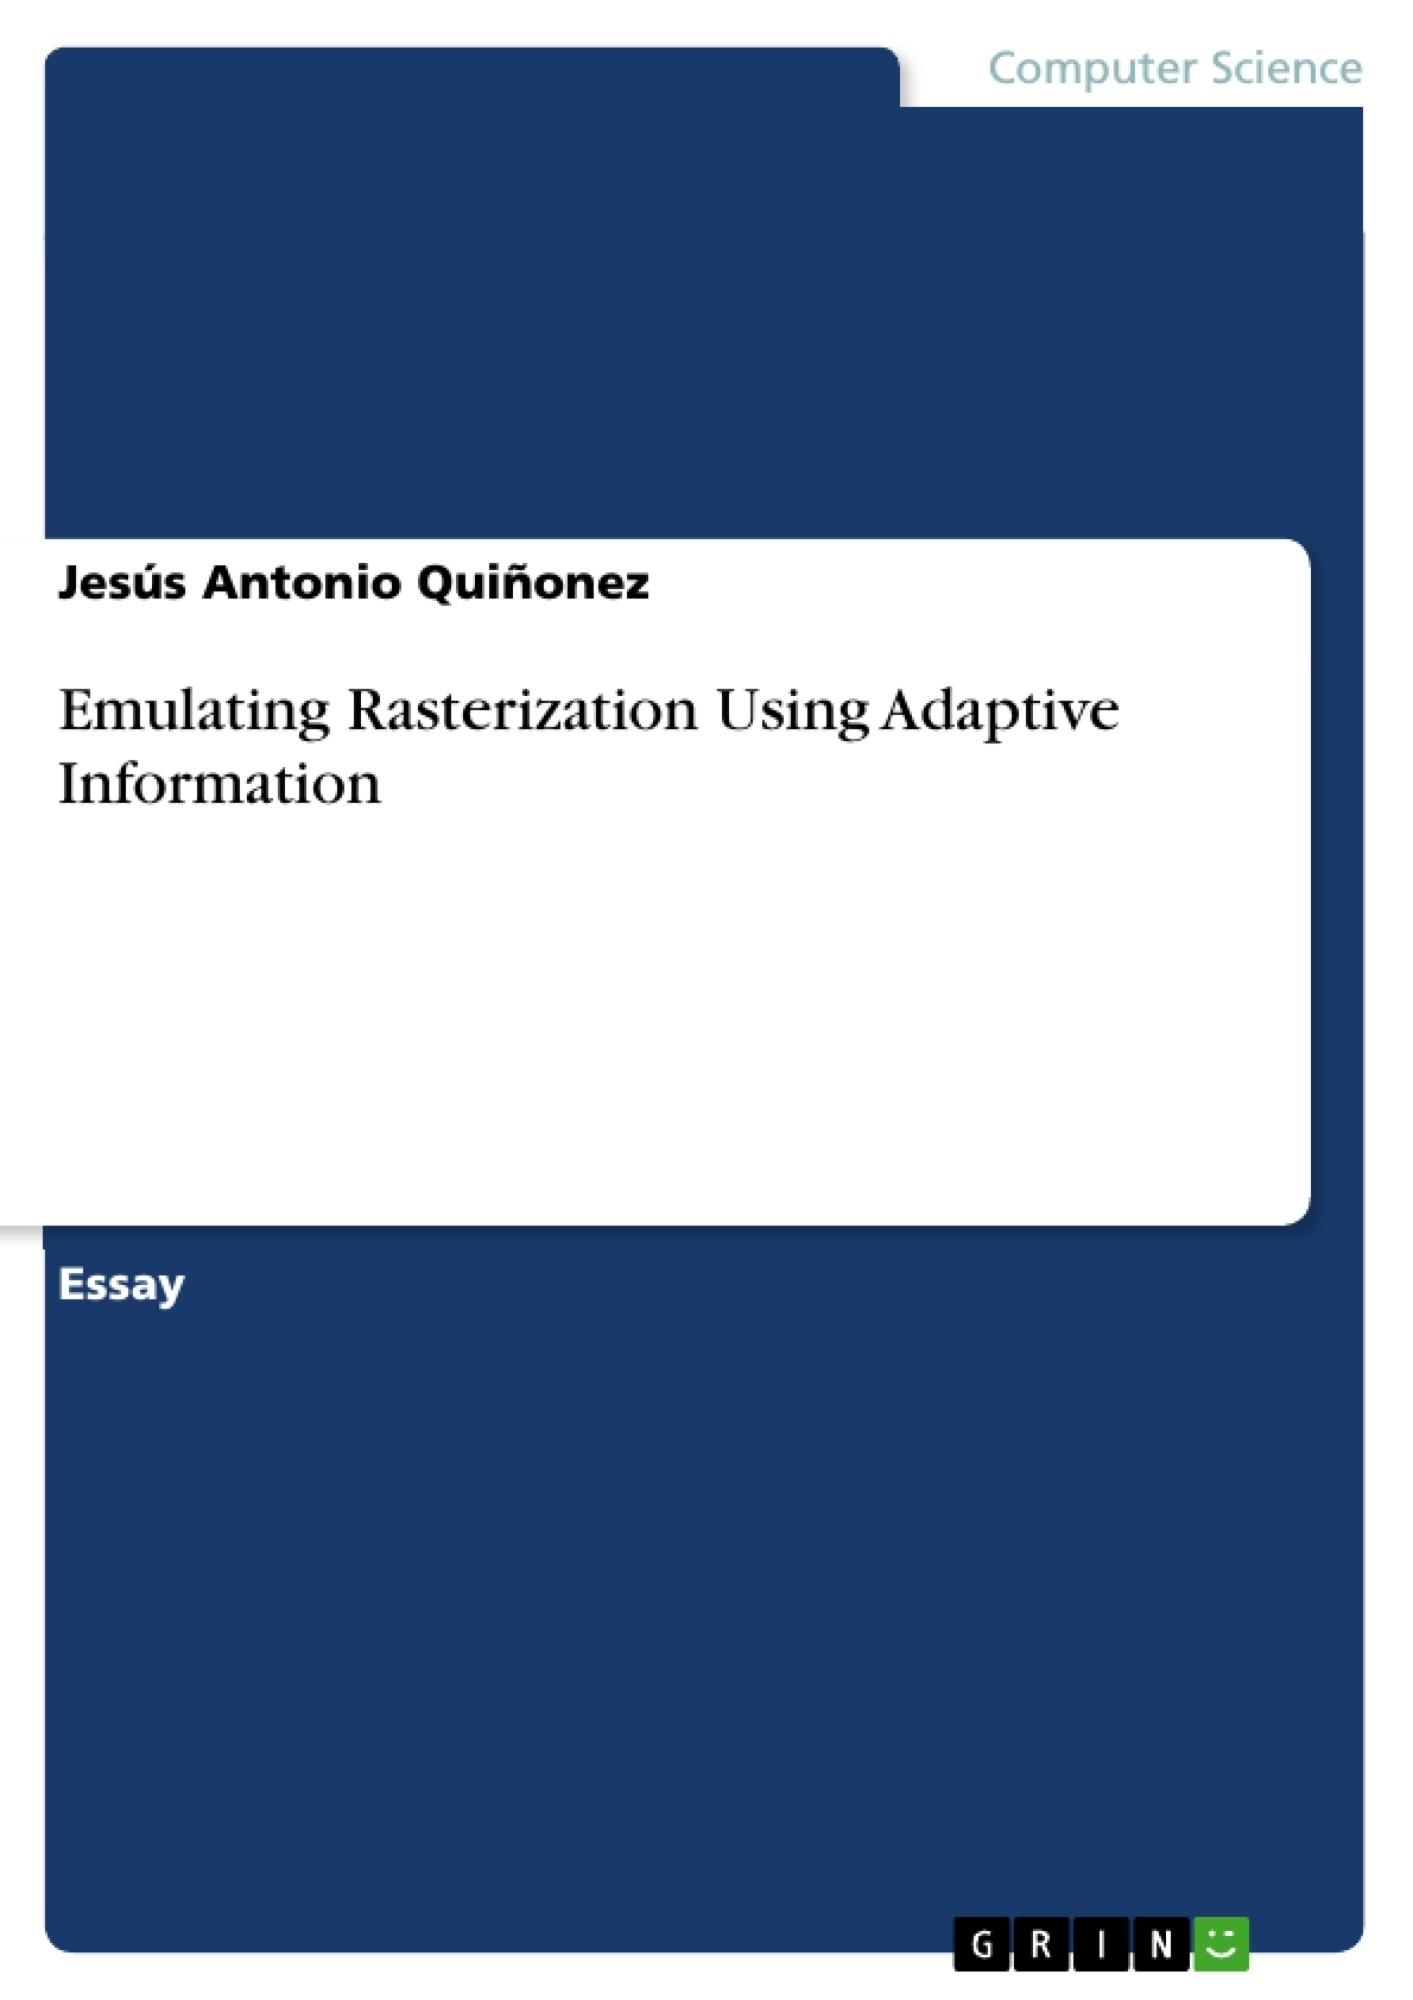 Title: Emulating Rasterization Using Adaptive Information